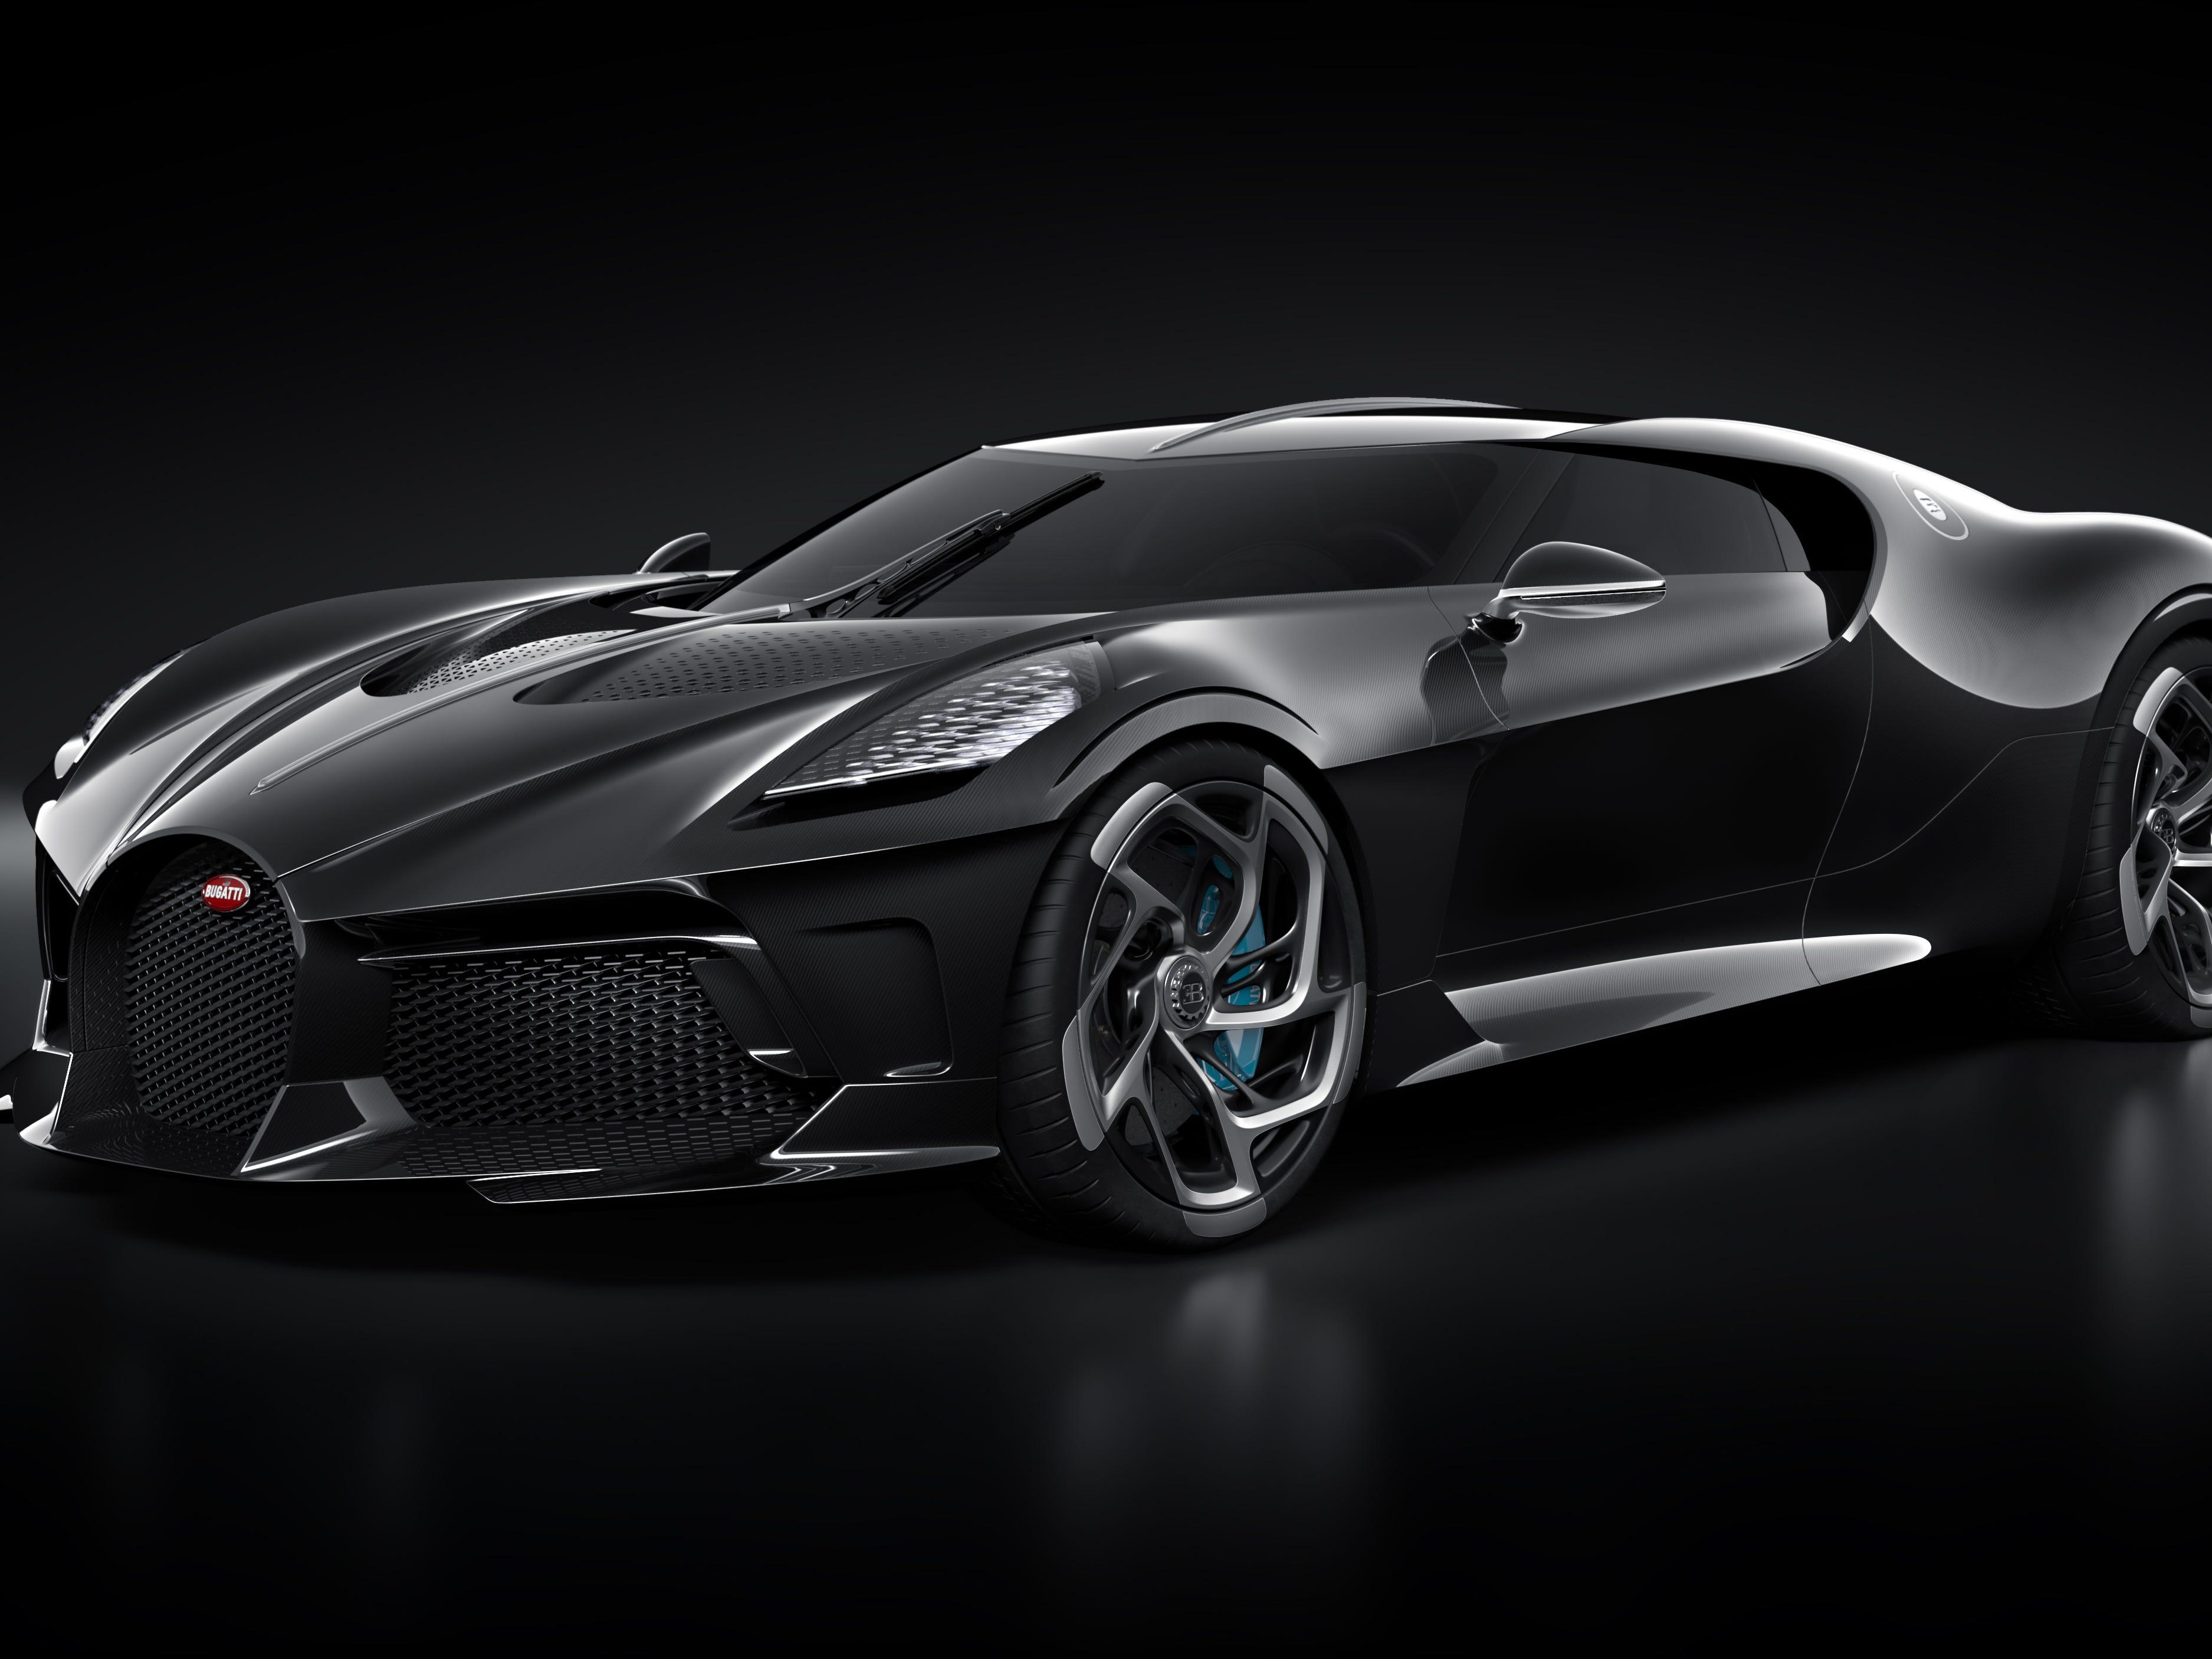 The two-door car looks like a Batmobile.